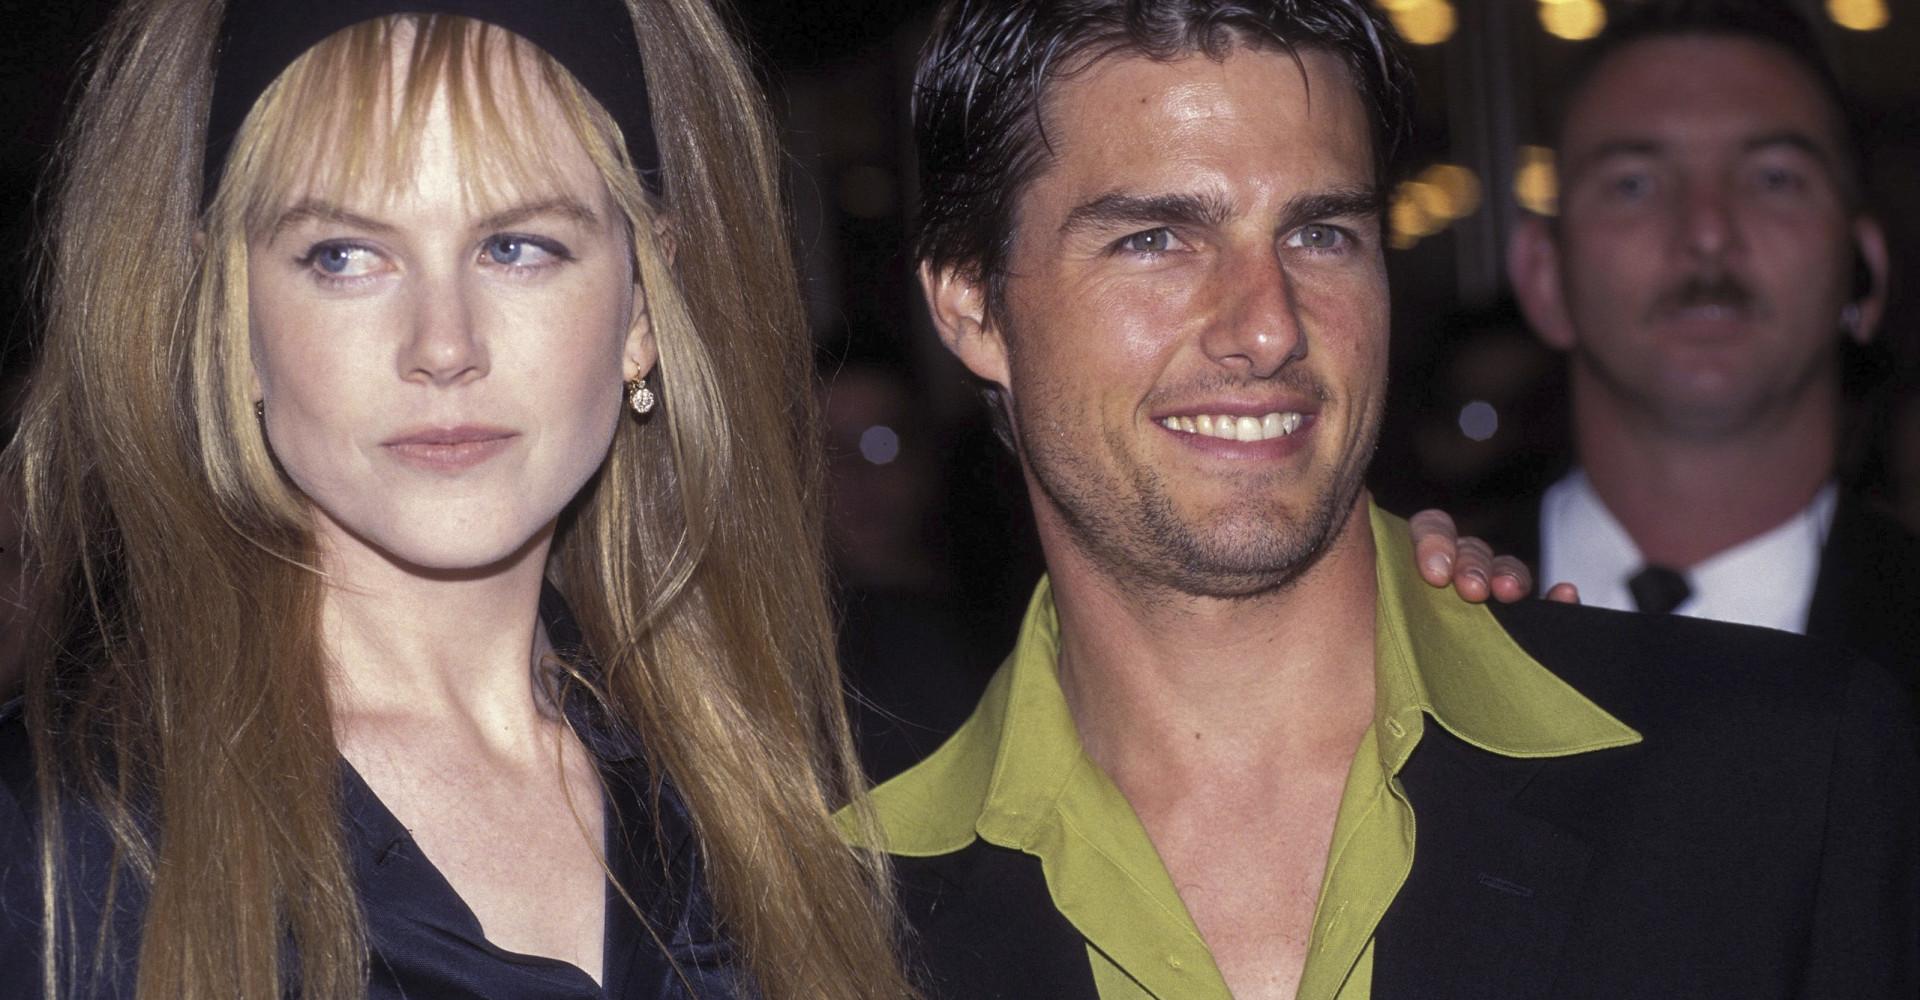 Nicole Kidman reveals she married Tom Cruise for protection